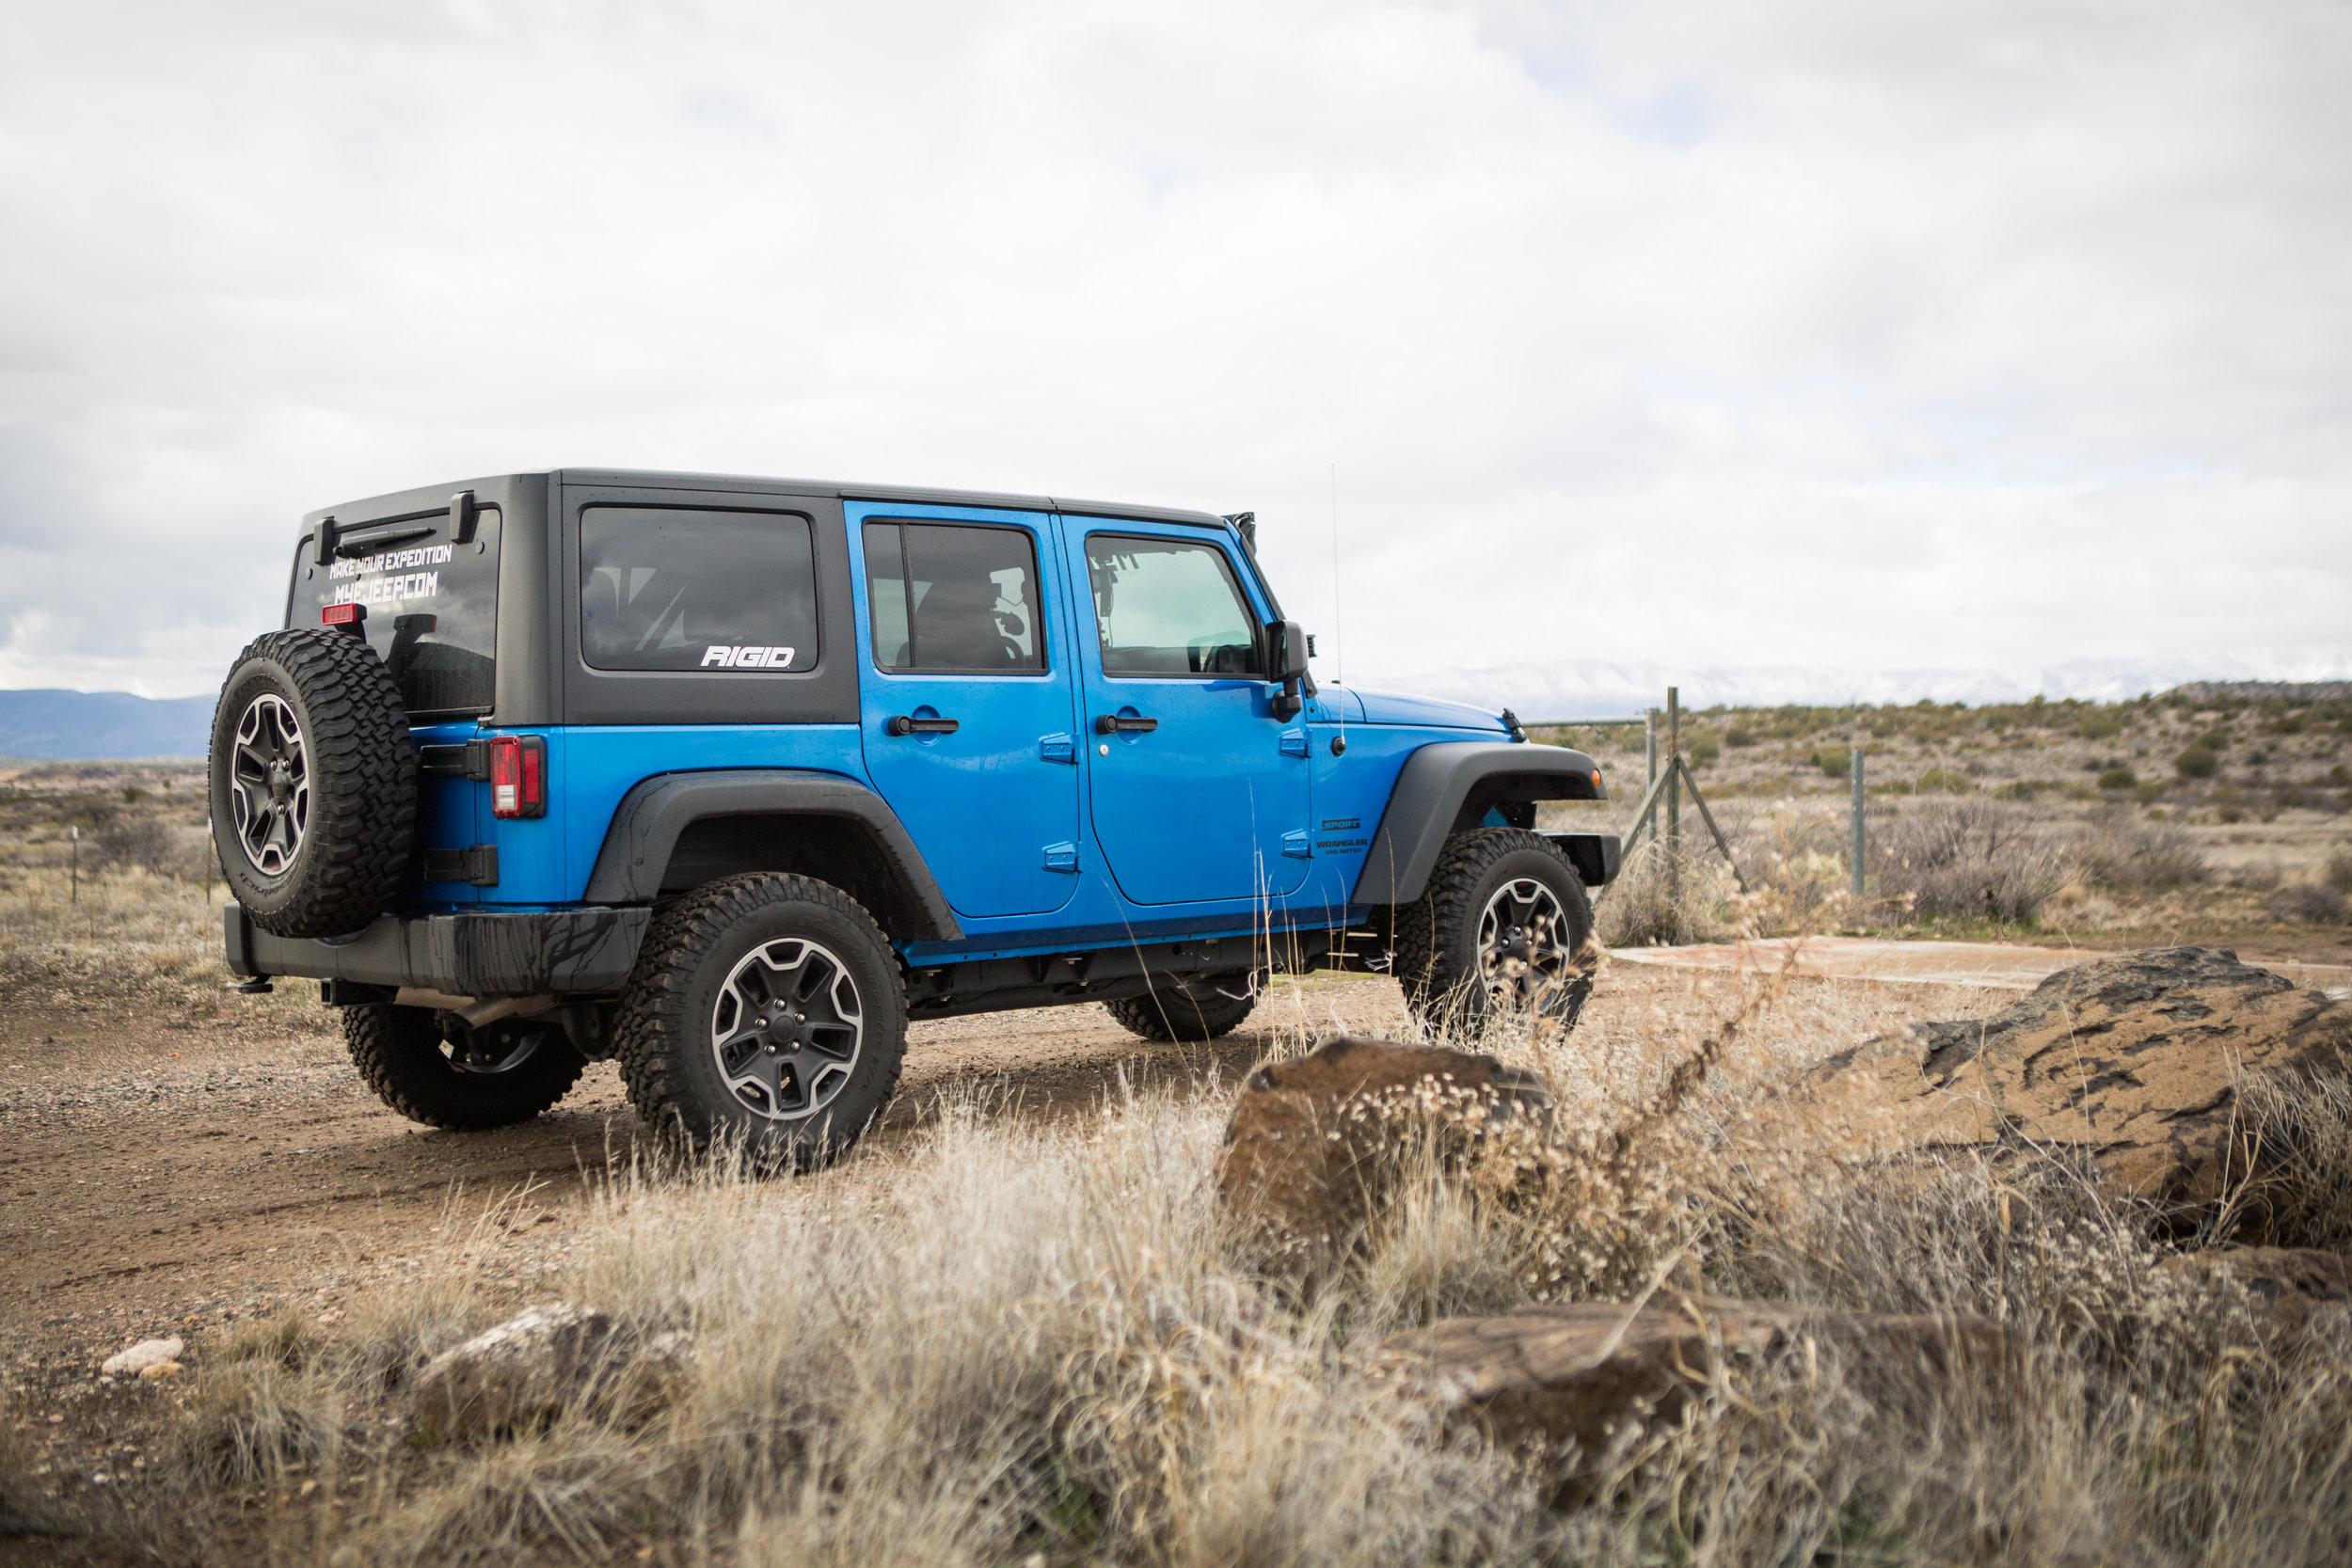 House Mountain Jeep 4x4 Trail Sedona